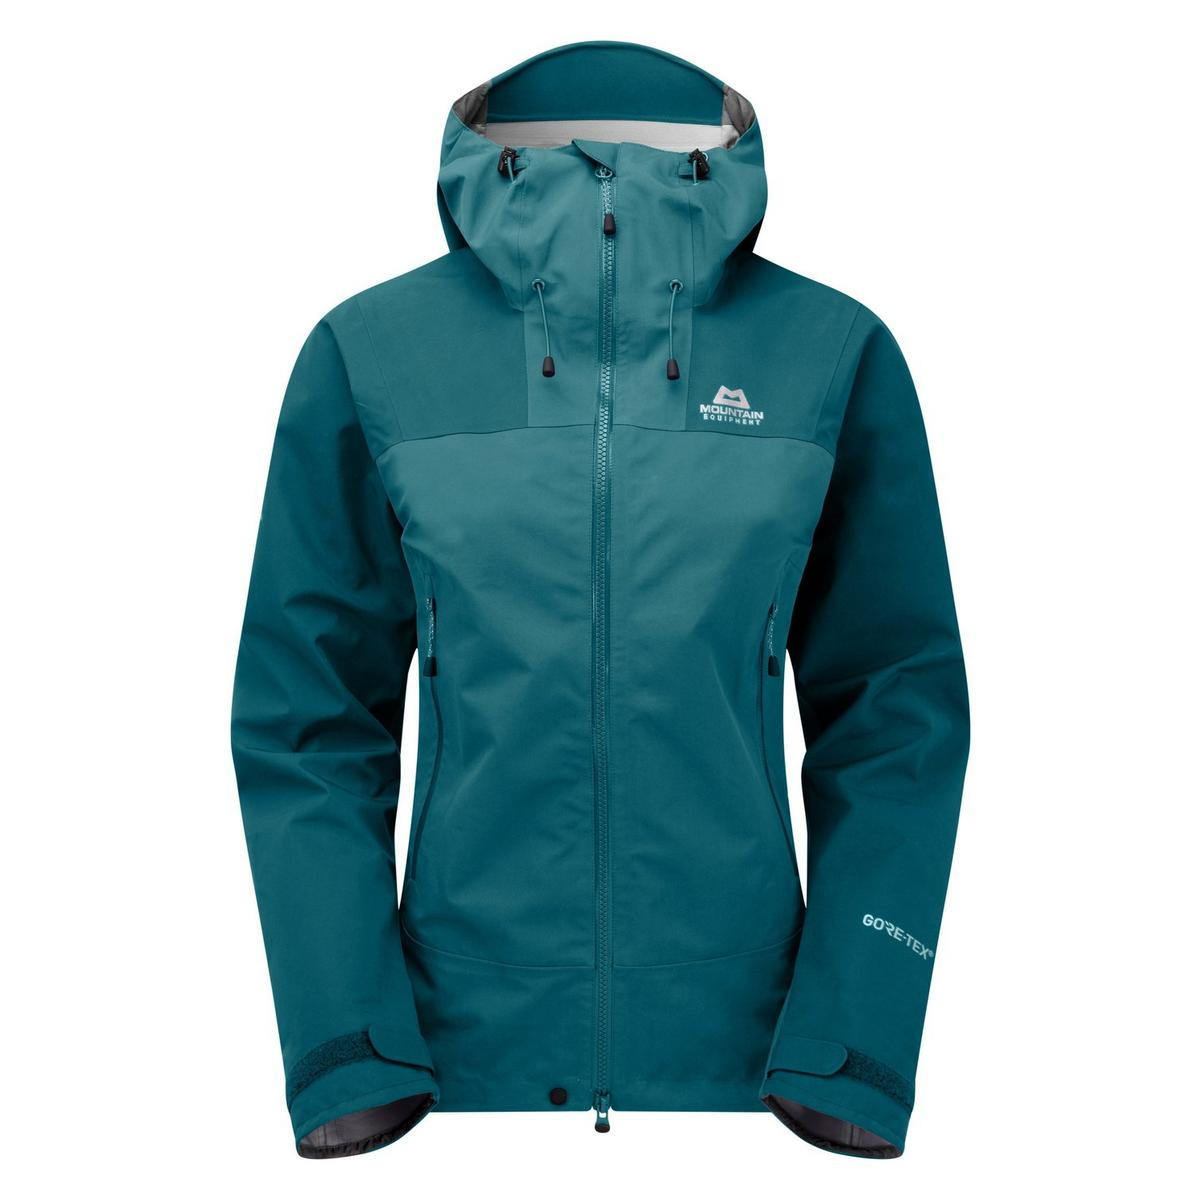 Mountain Equipment Women's Rupal Gore-Tex Waterproof Jacket